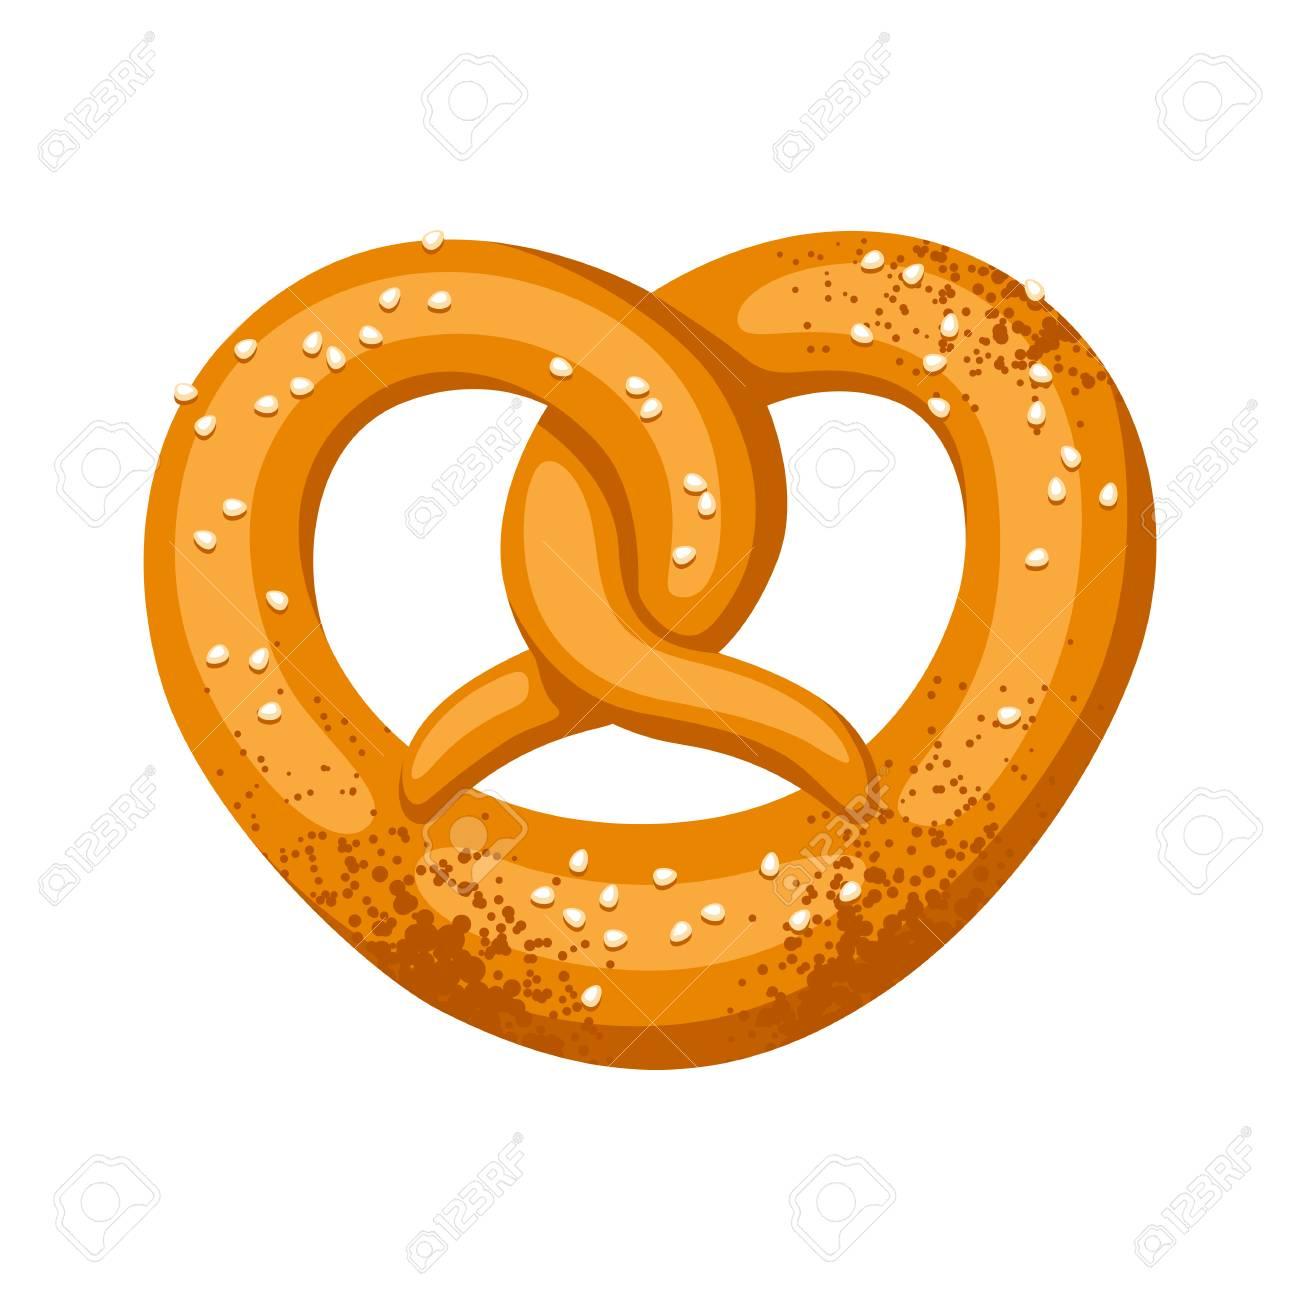 pretzel salt and soft illustration for oktoberfest royalty free